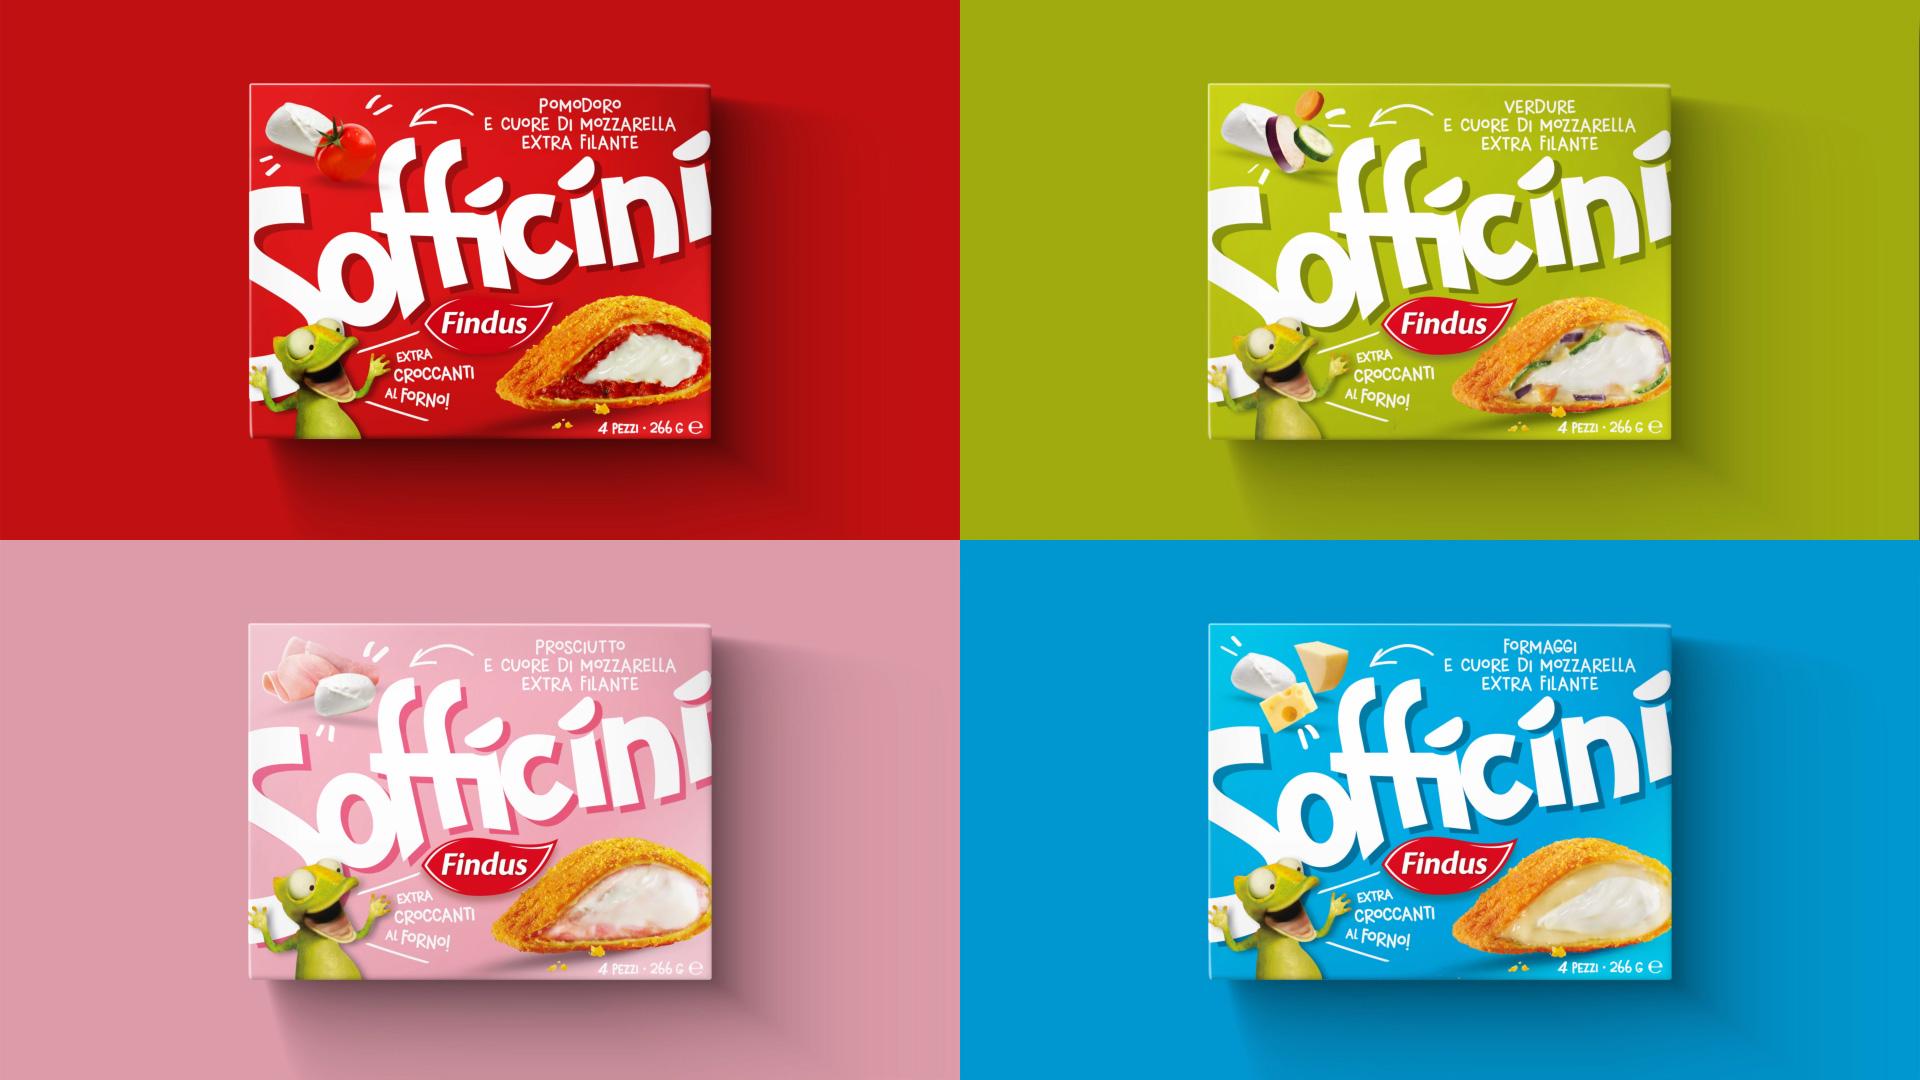 Sofficini-Findus-Rba-Design-003